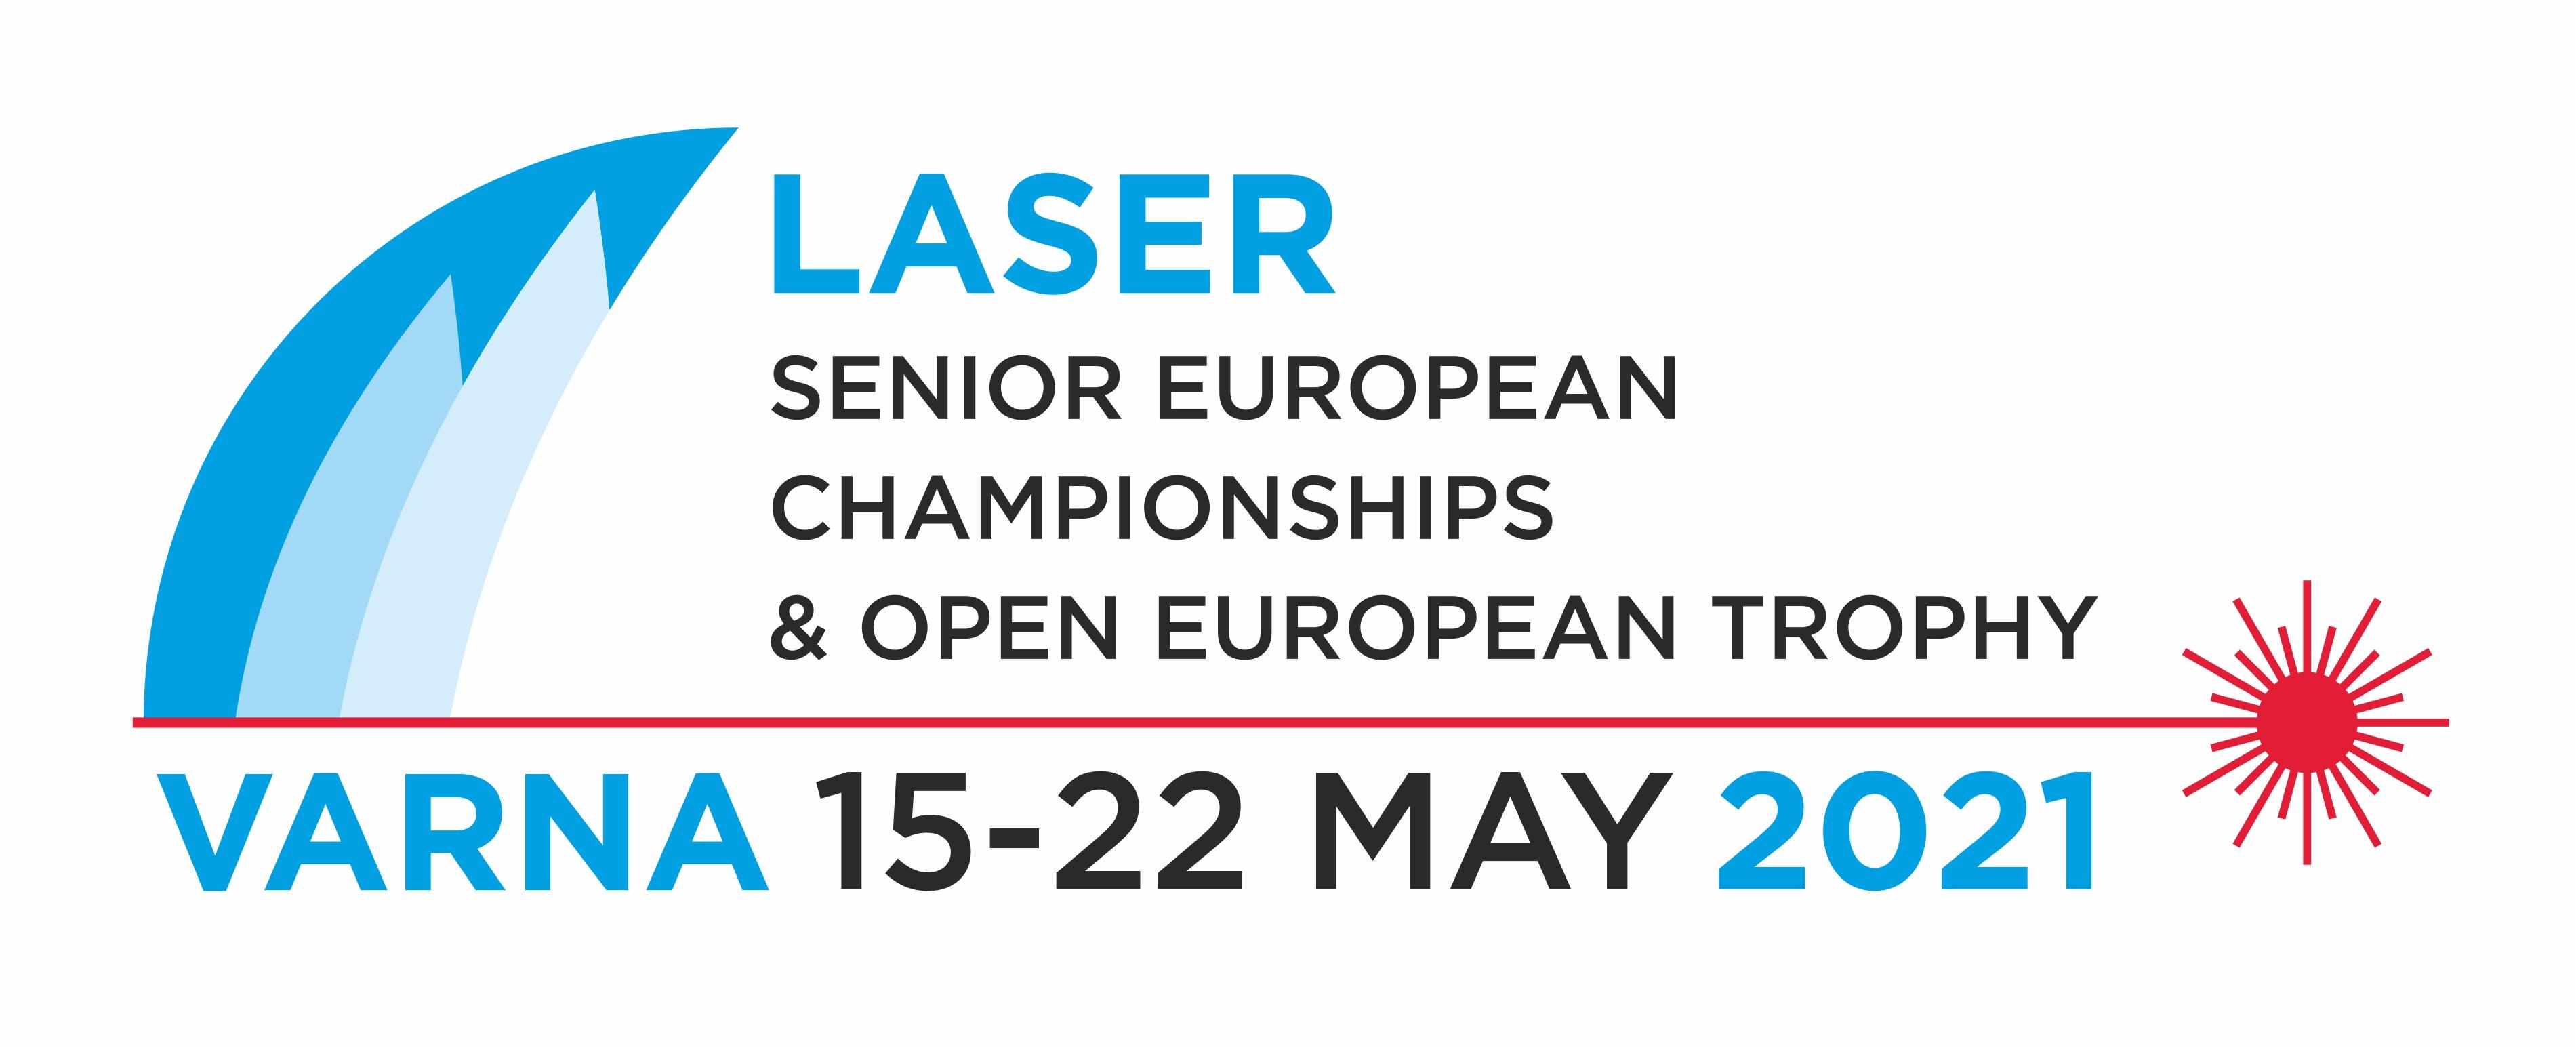 Senior European Championships & Open European Trophy 2021